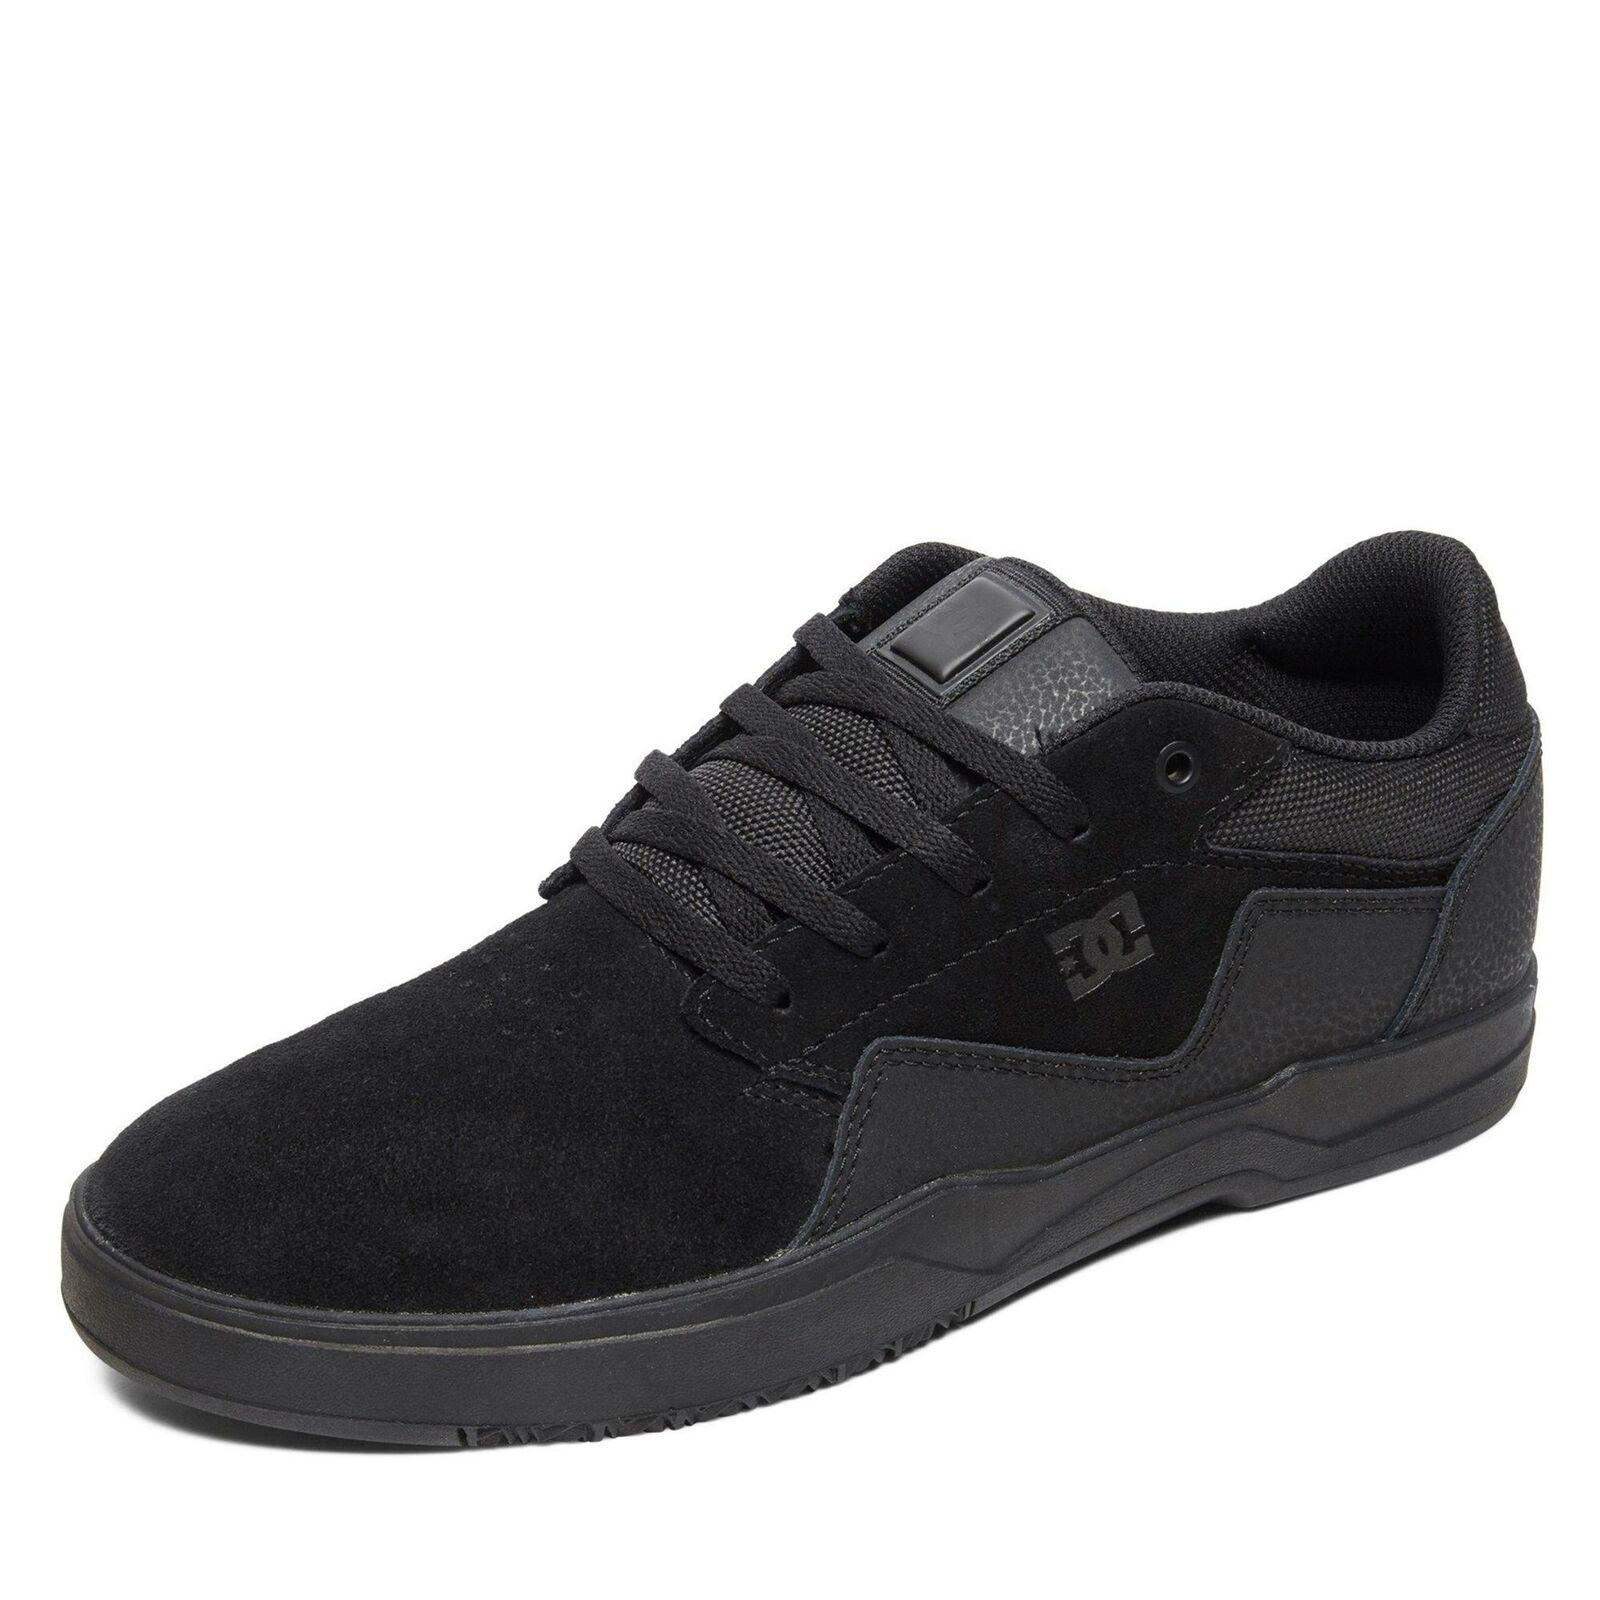 DC Barksdale Herren Turnschuhe Turnschuhe Sportschuhe Laufschuhe Schuhe schwarz